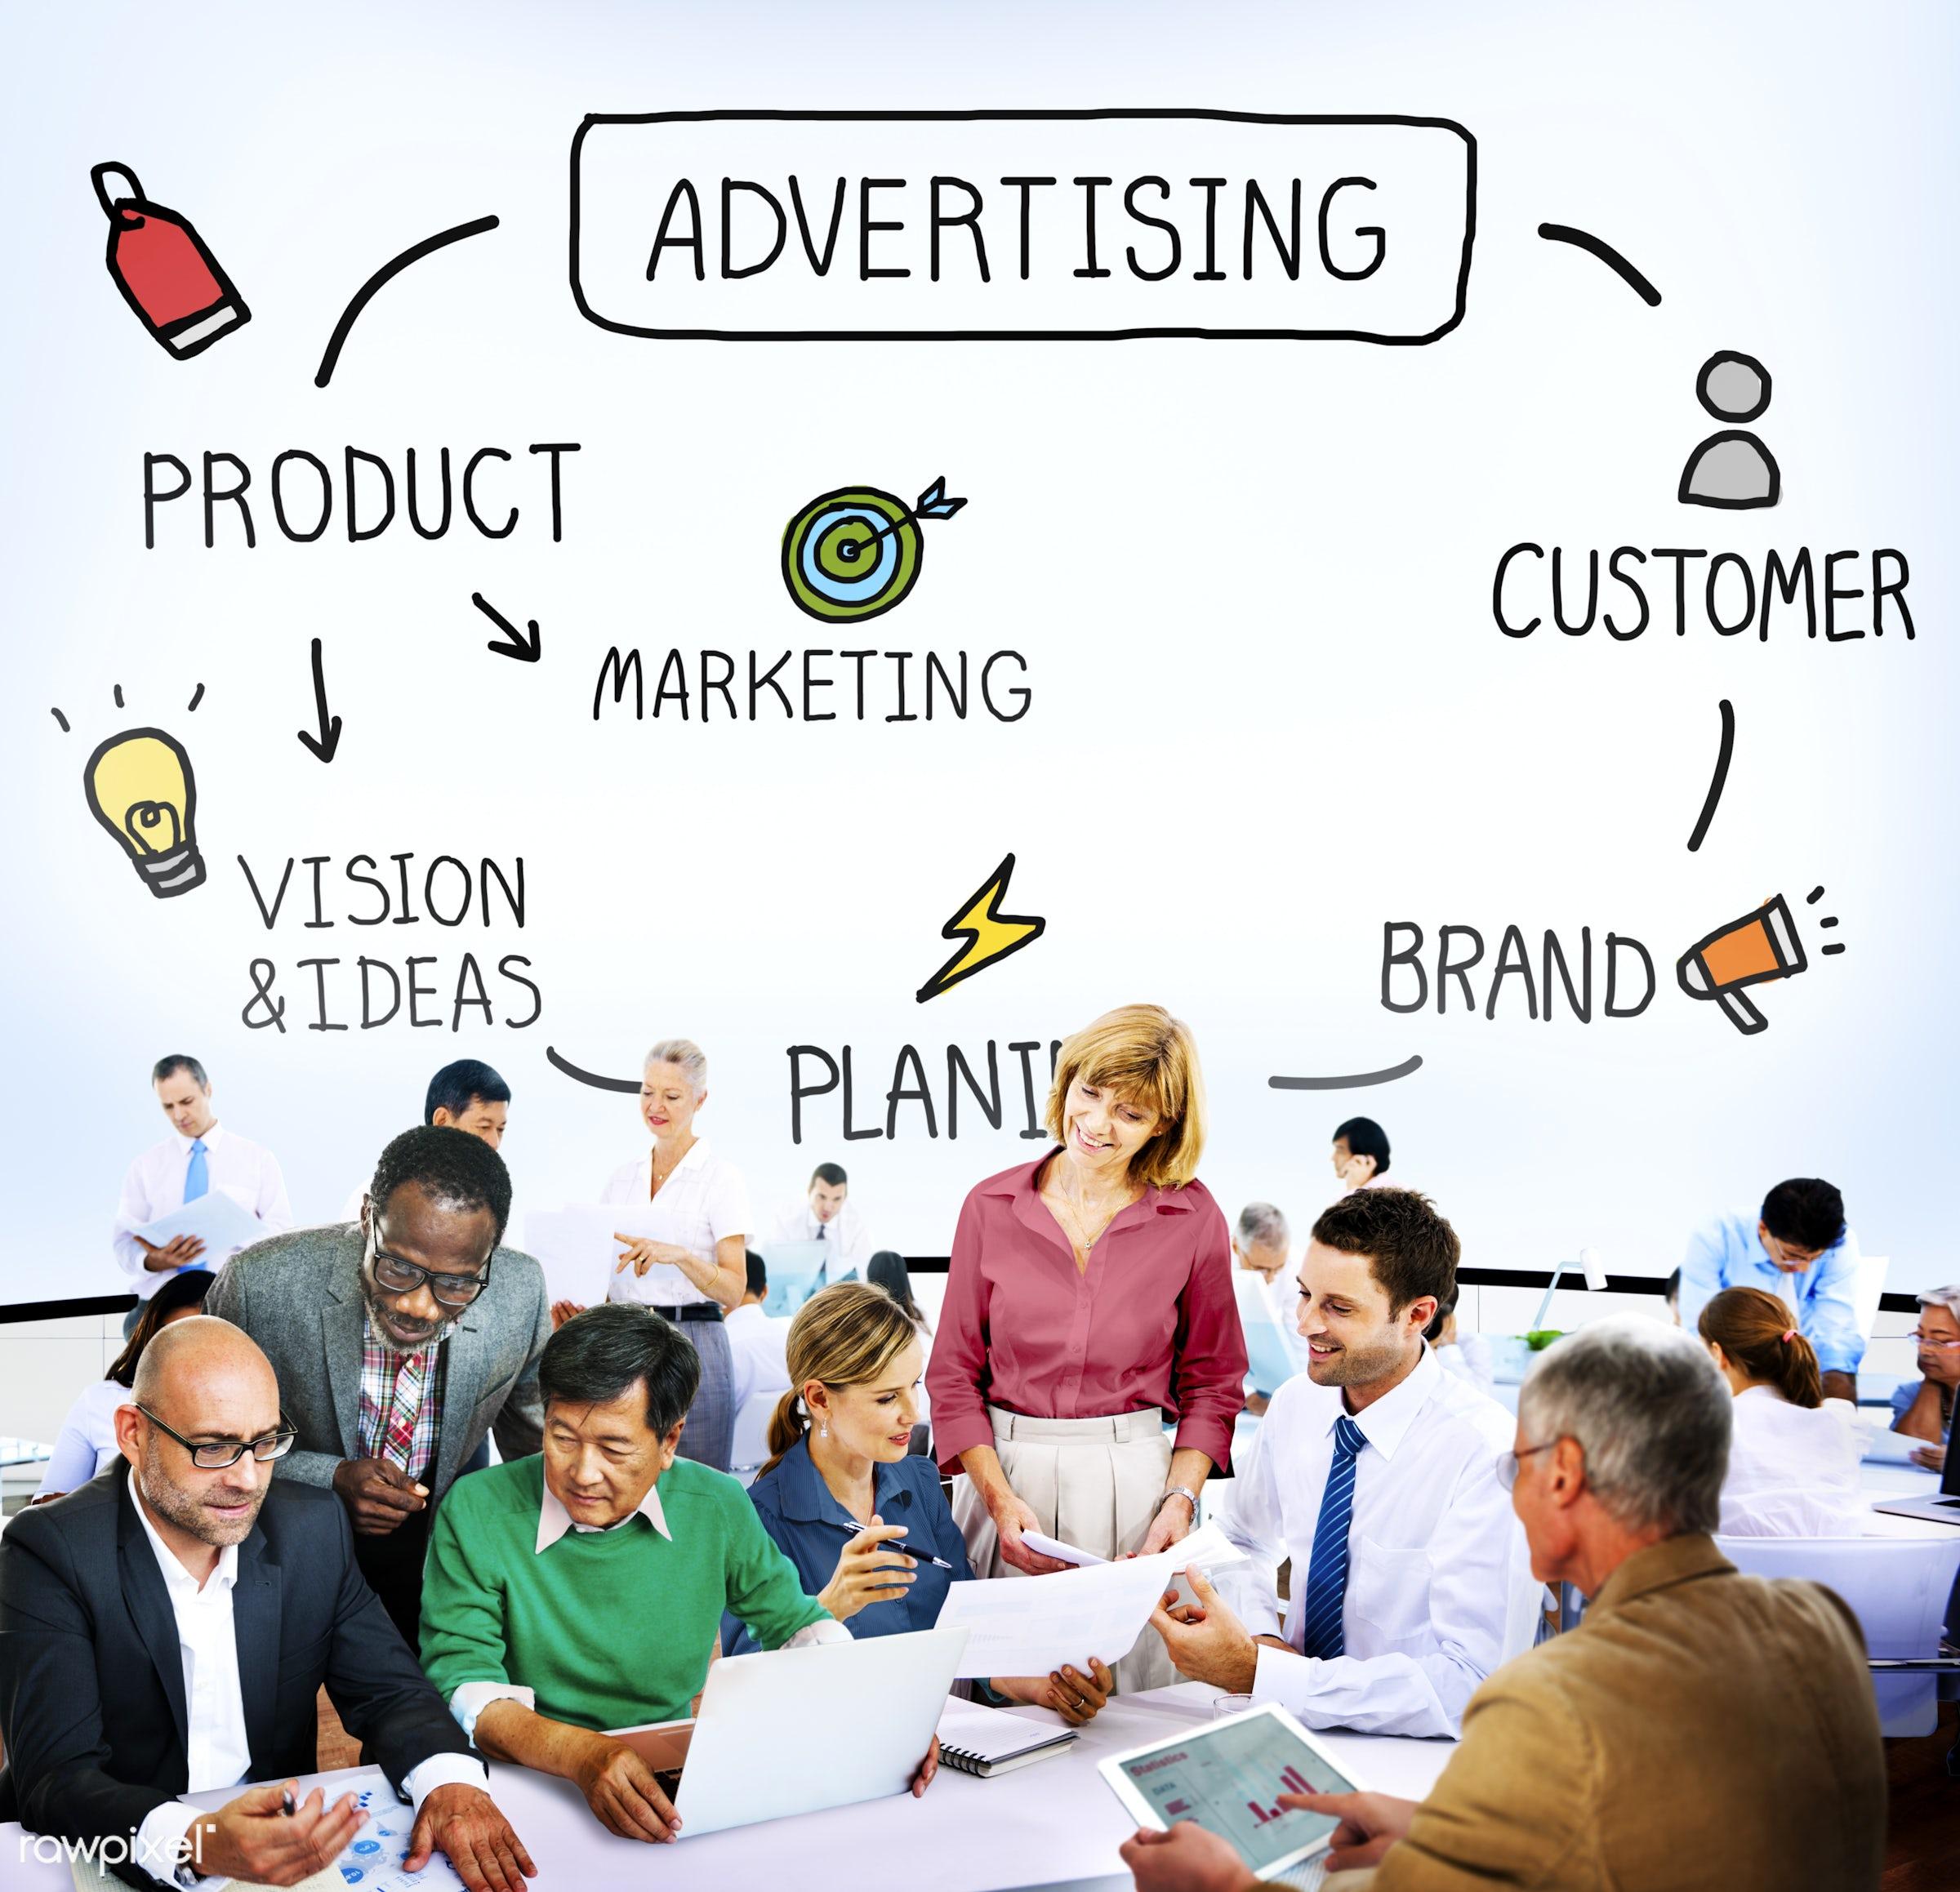 advertise, advertisement, advertising, analysis, brand, branding, business, business people, businessmen, businesswomen,...